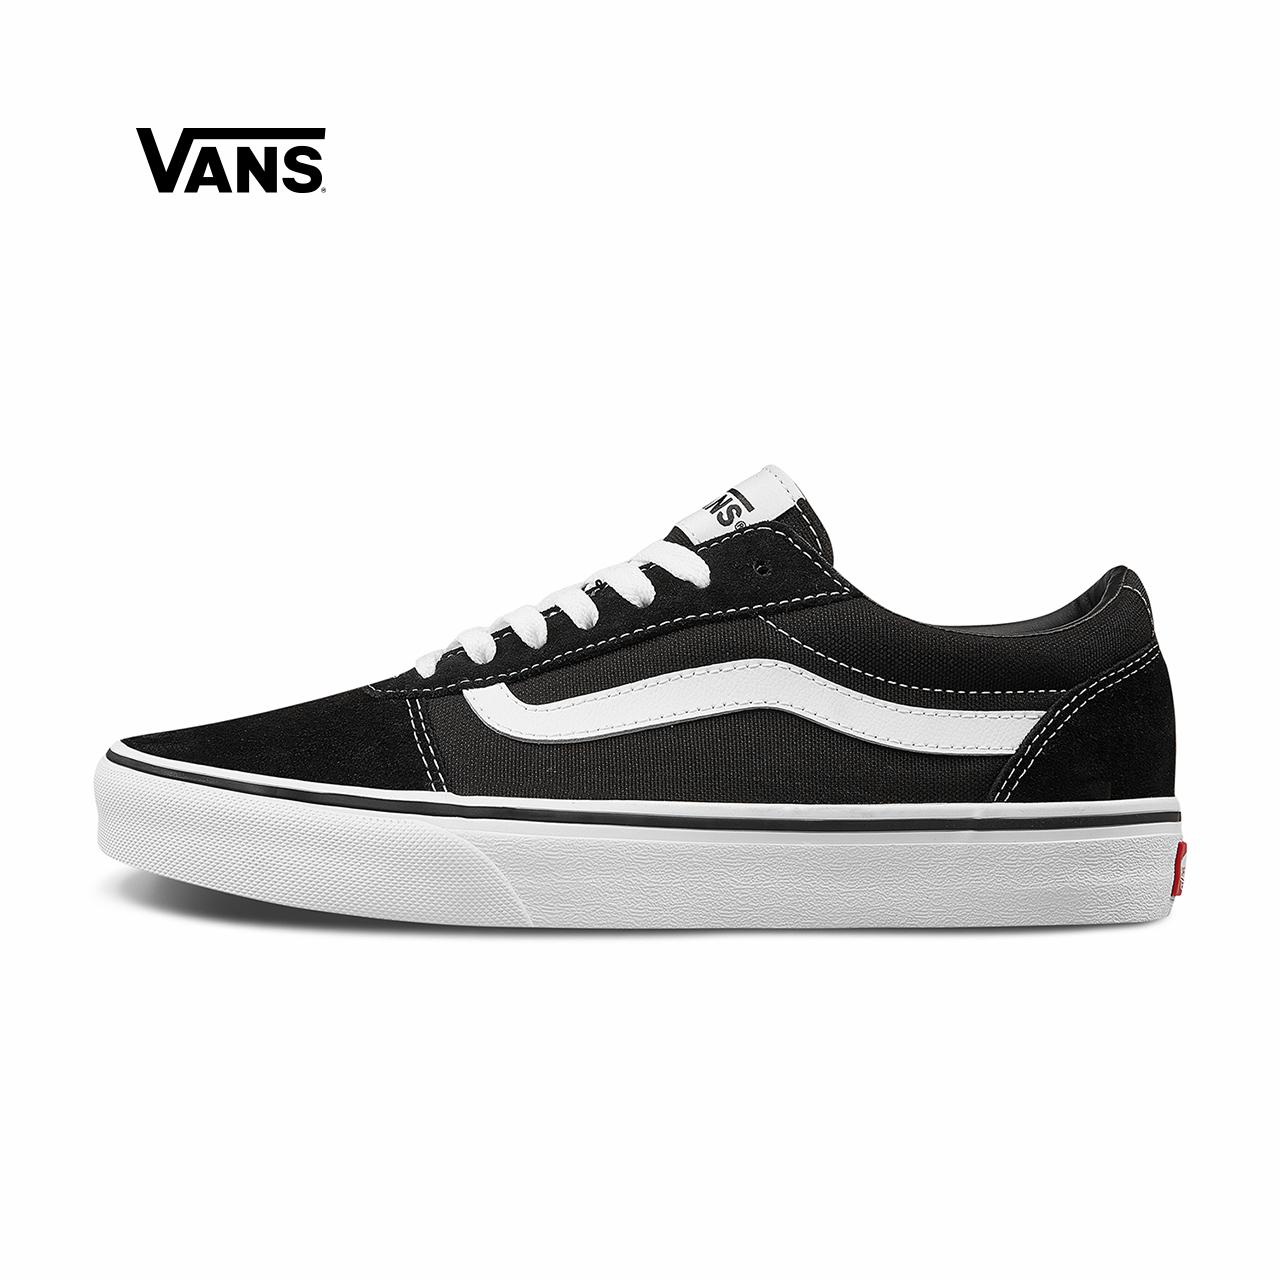 Vans范斯官方 黑色侧边条纹男鞋Ward低帮经典板鞋运动鞋